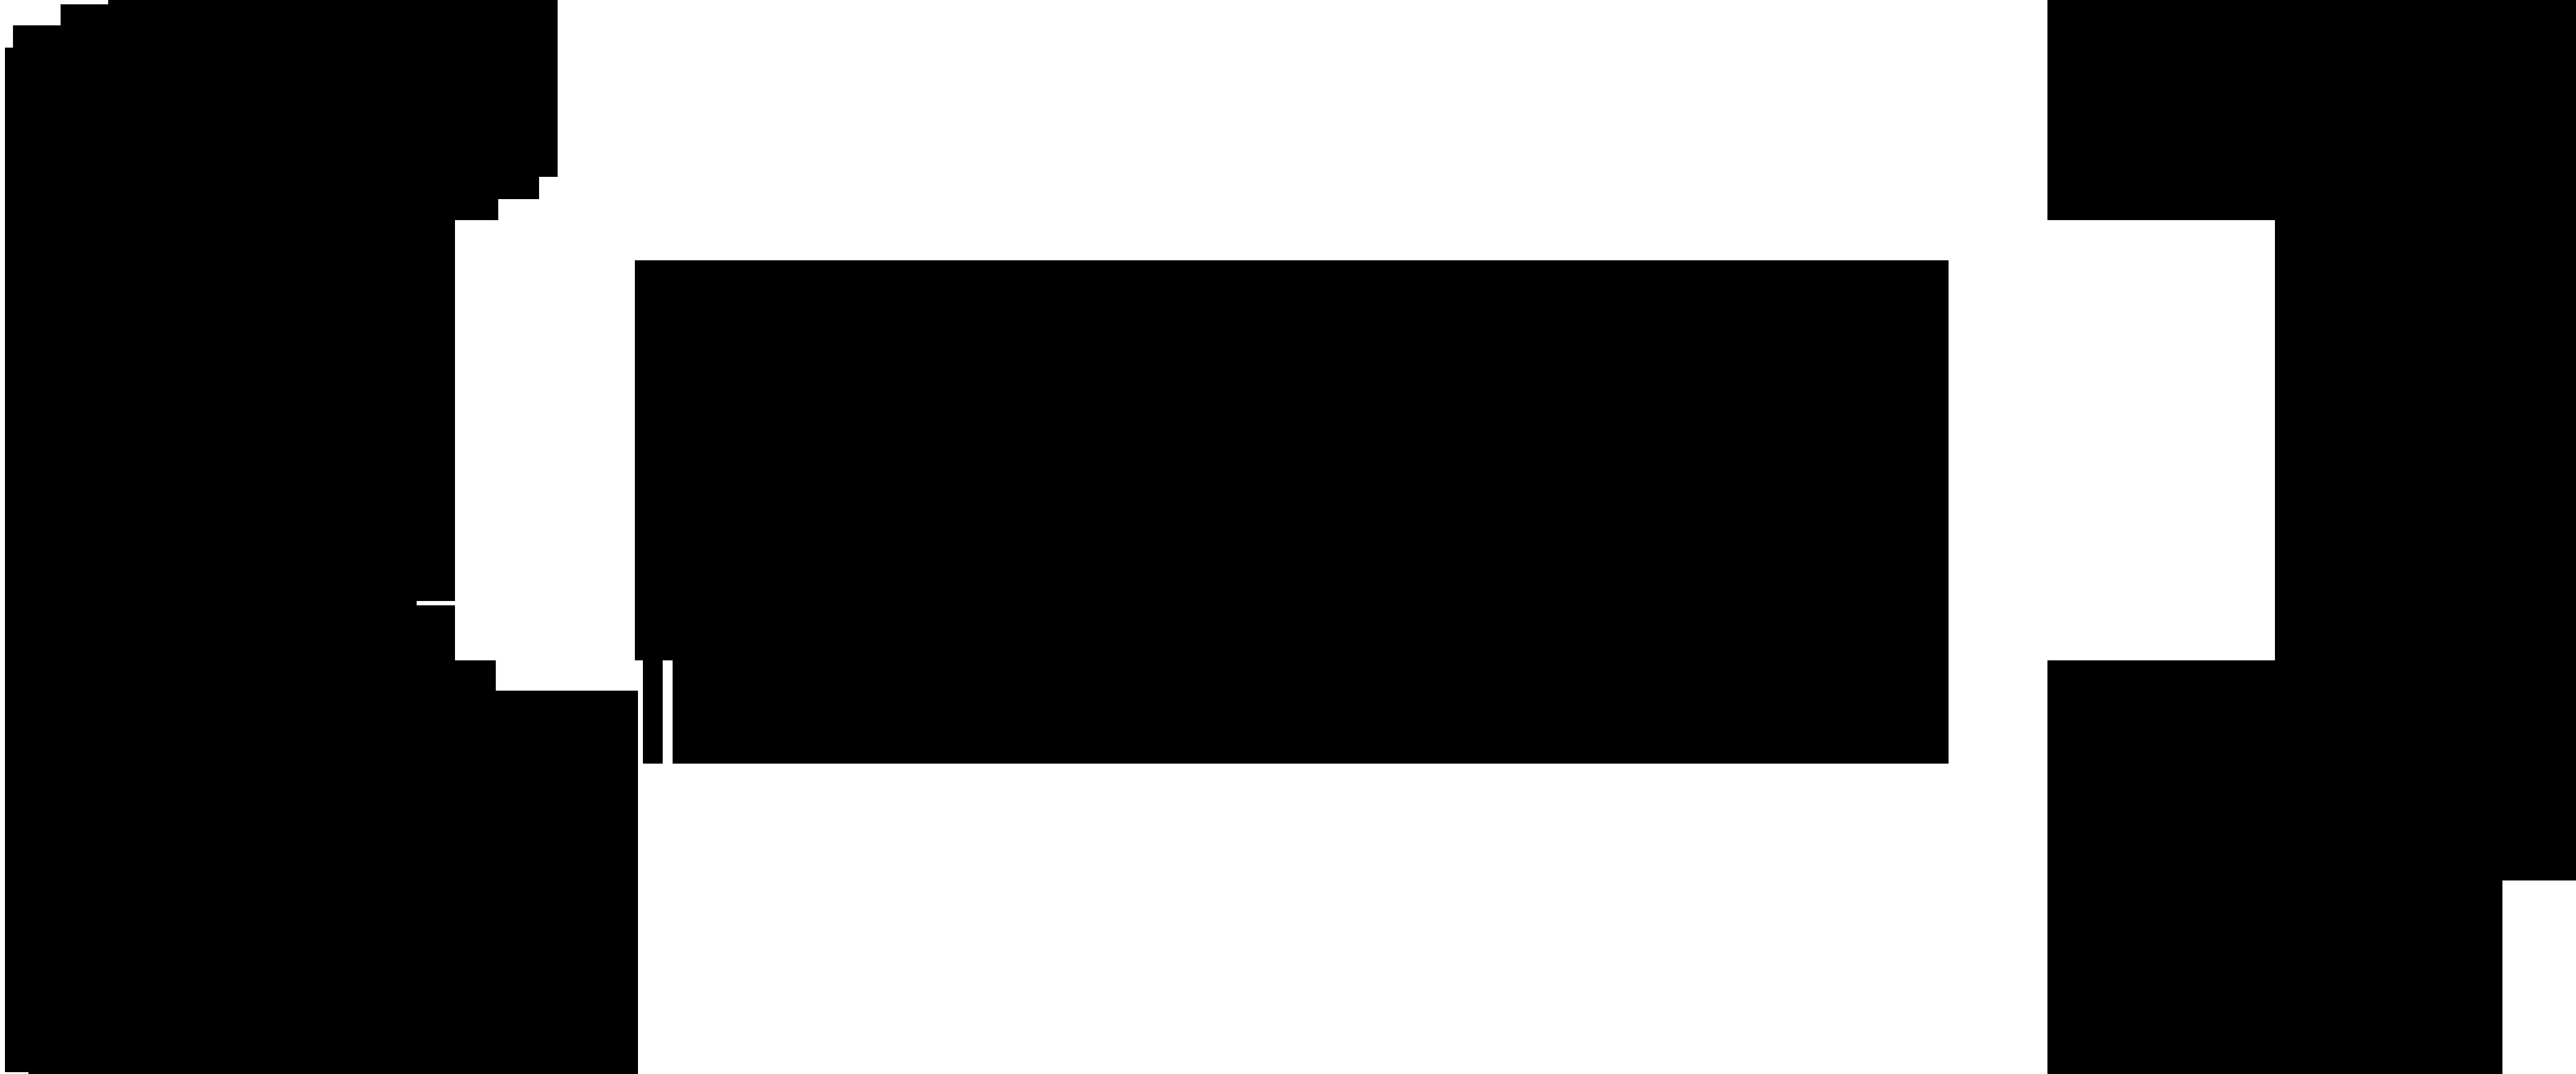 laurel-naturman-2015